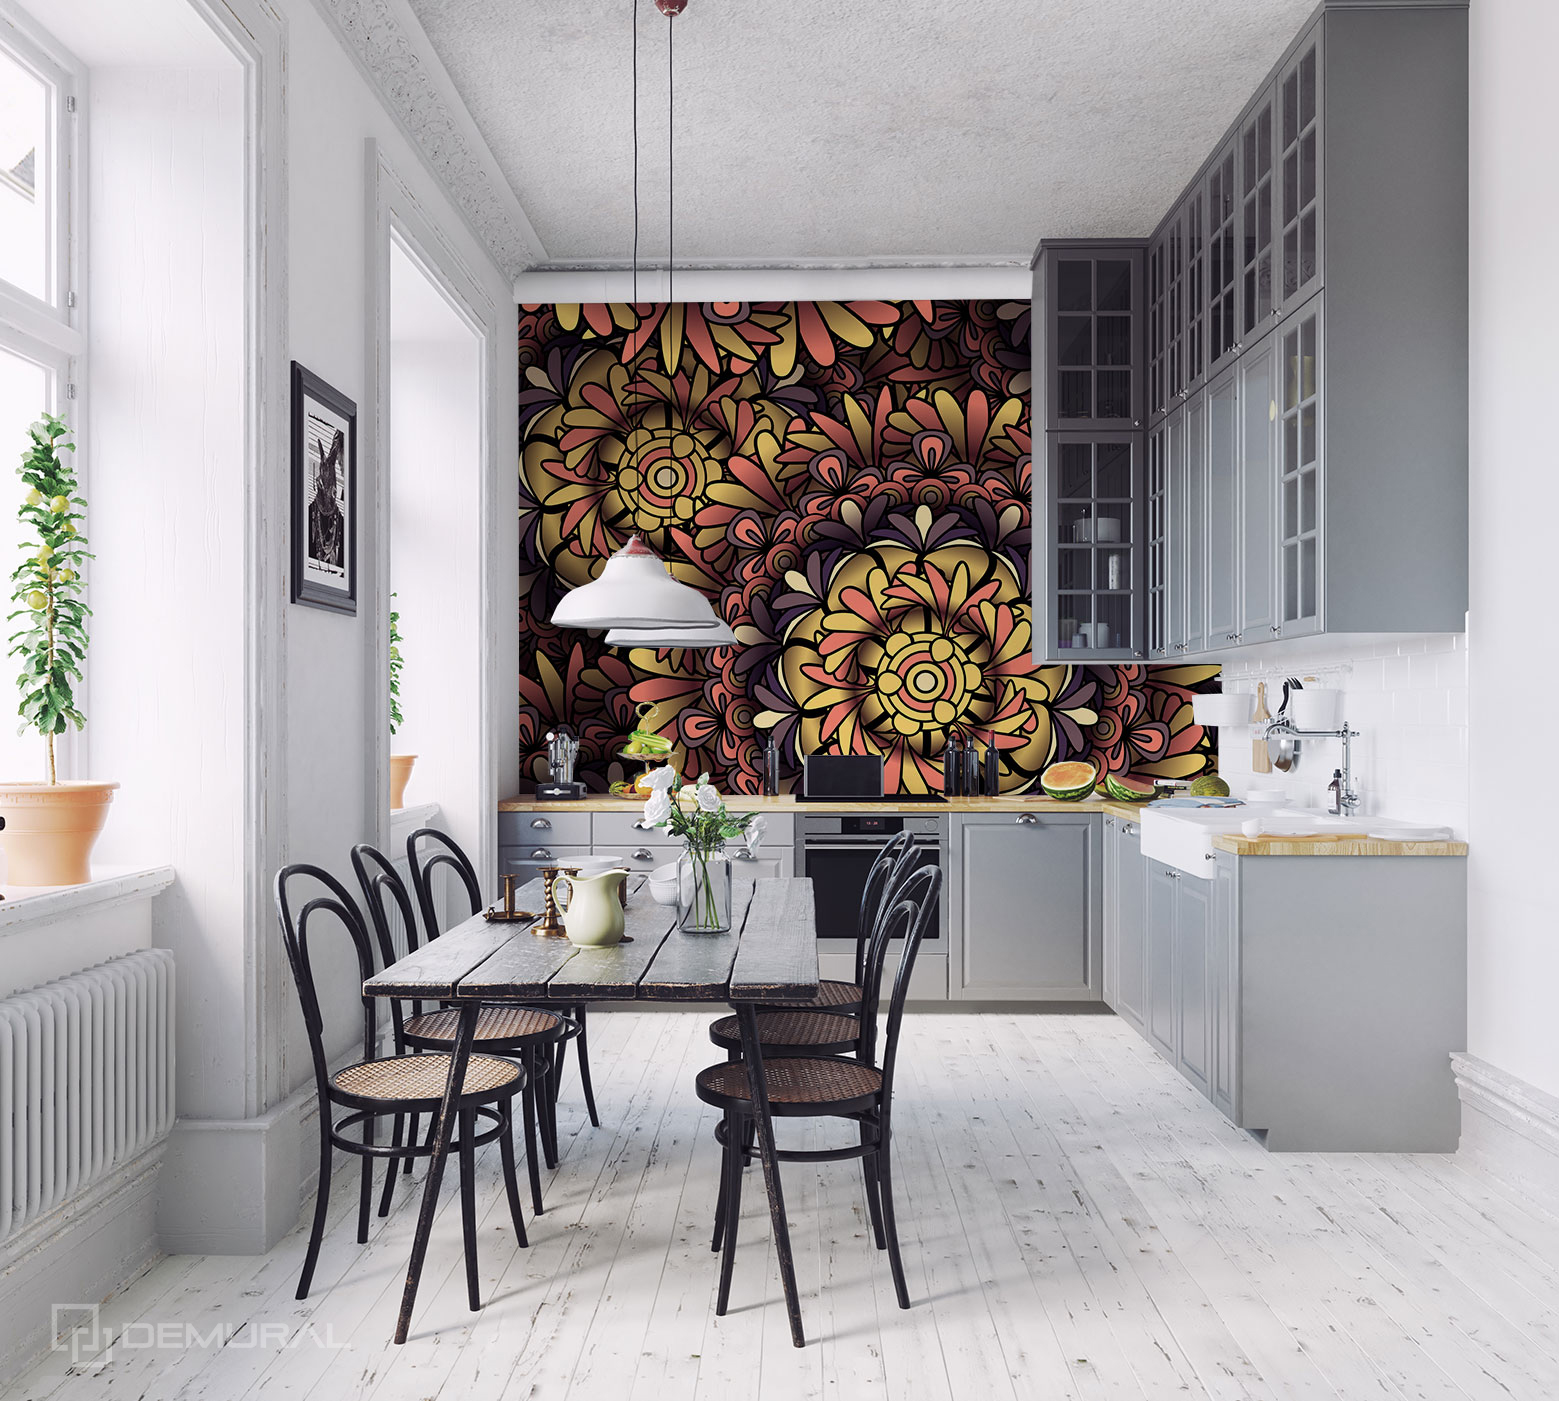 Fototapete Ein stilvolles Mandala - Fototapete für große Küche - Demural